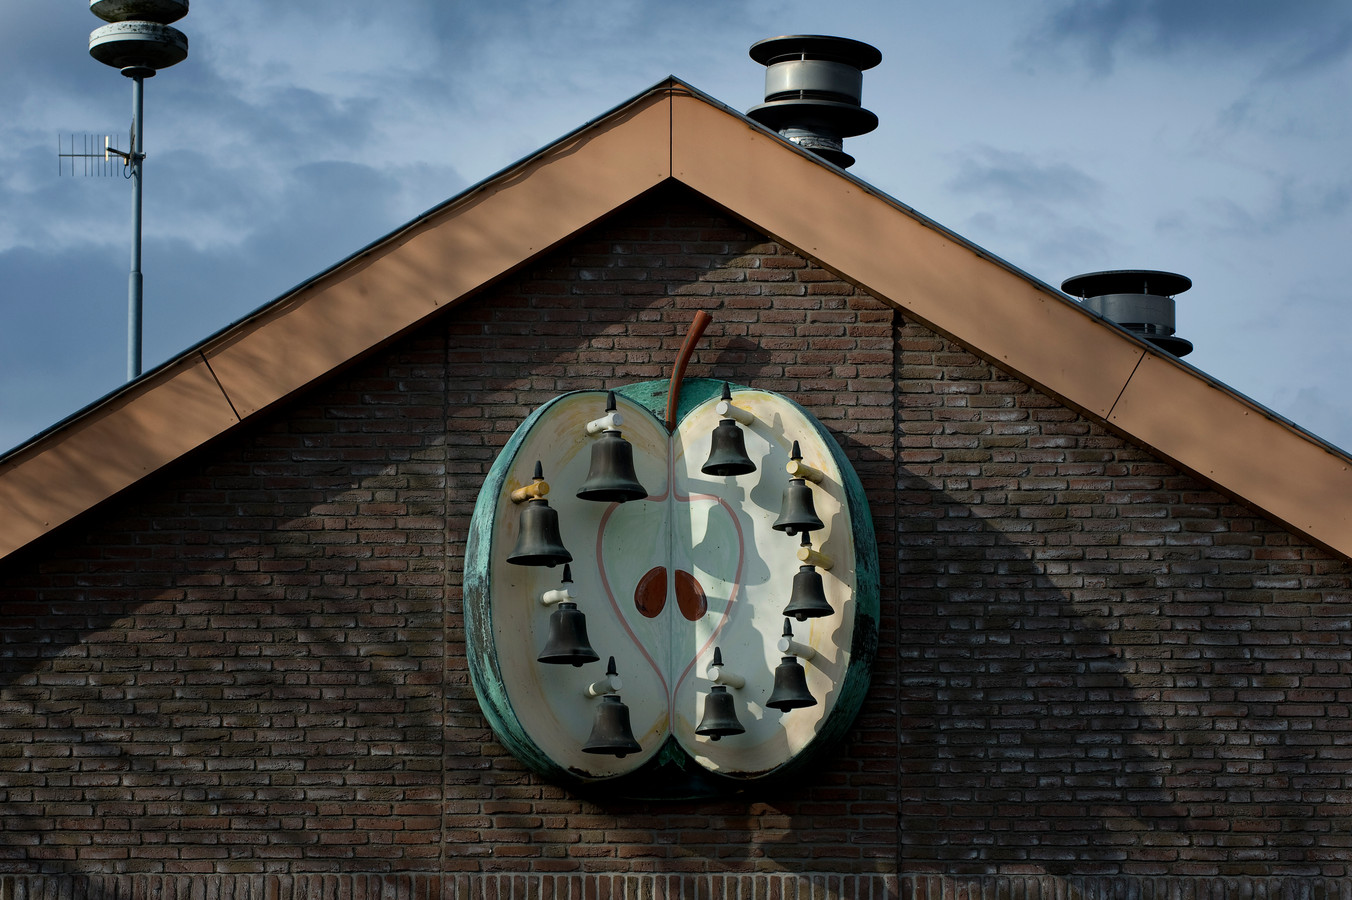 Dorpshuis 't Klokhuis in Maurik.